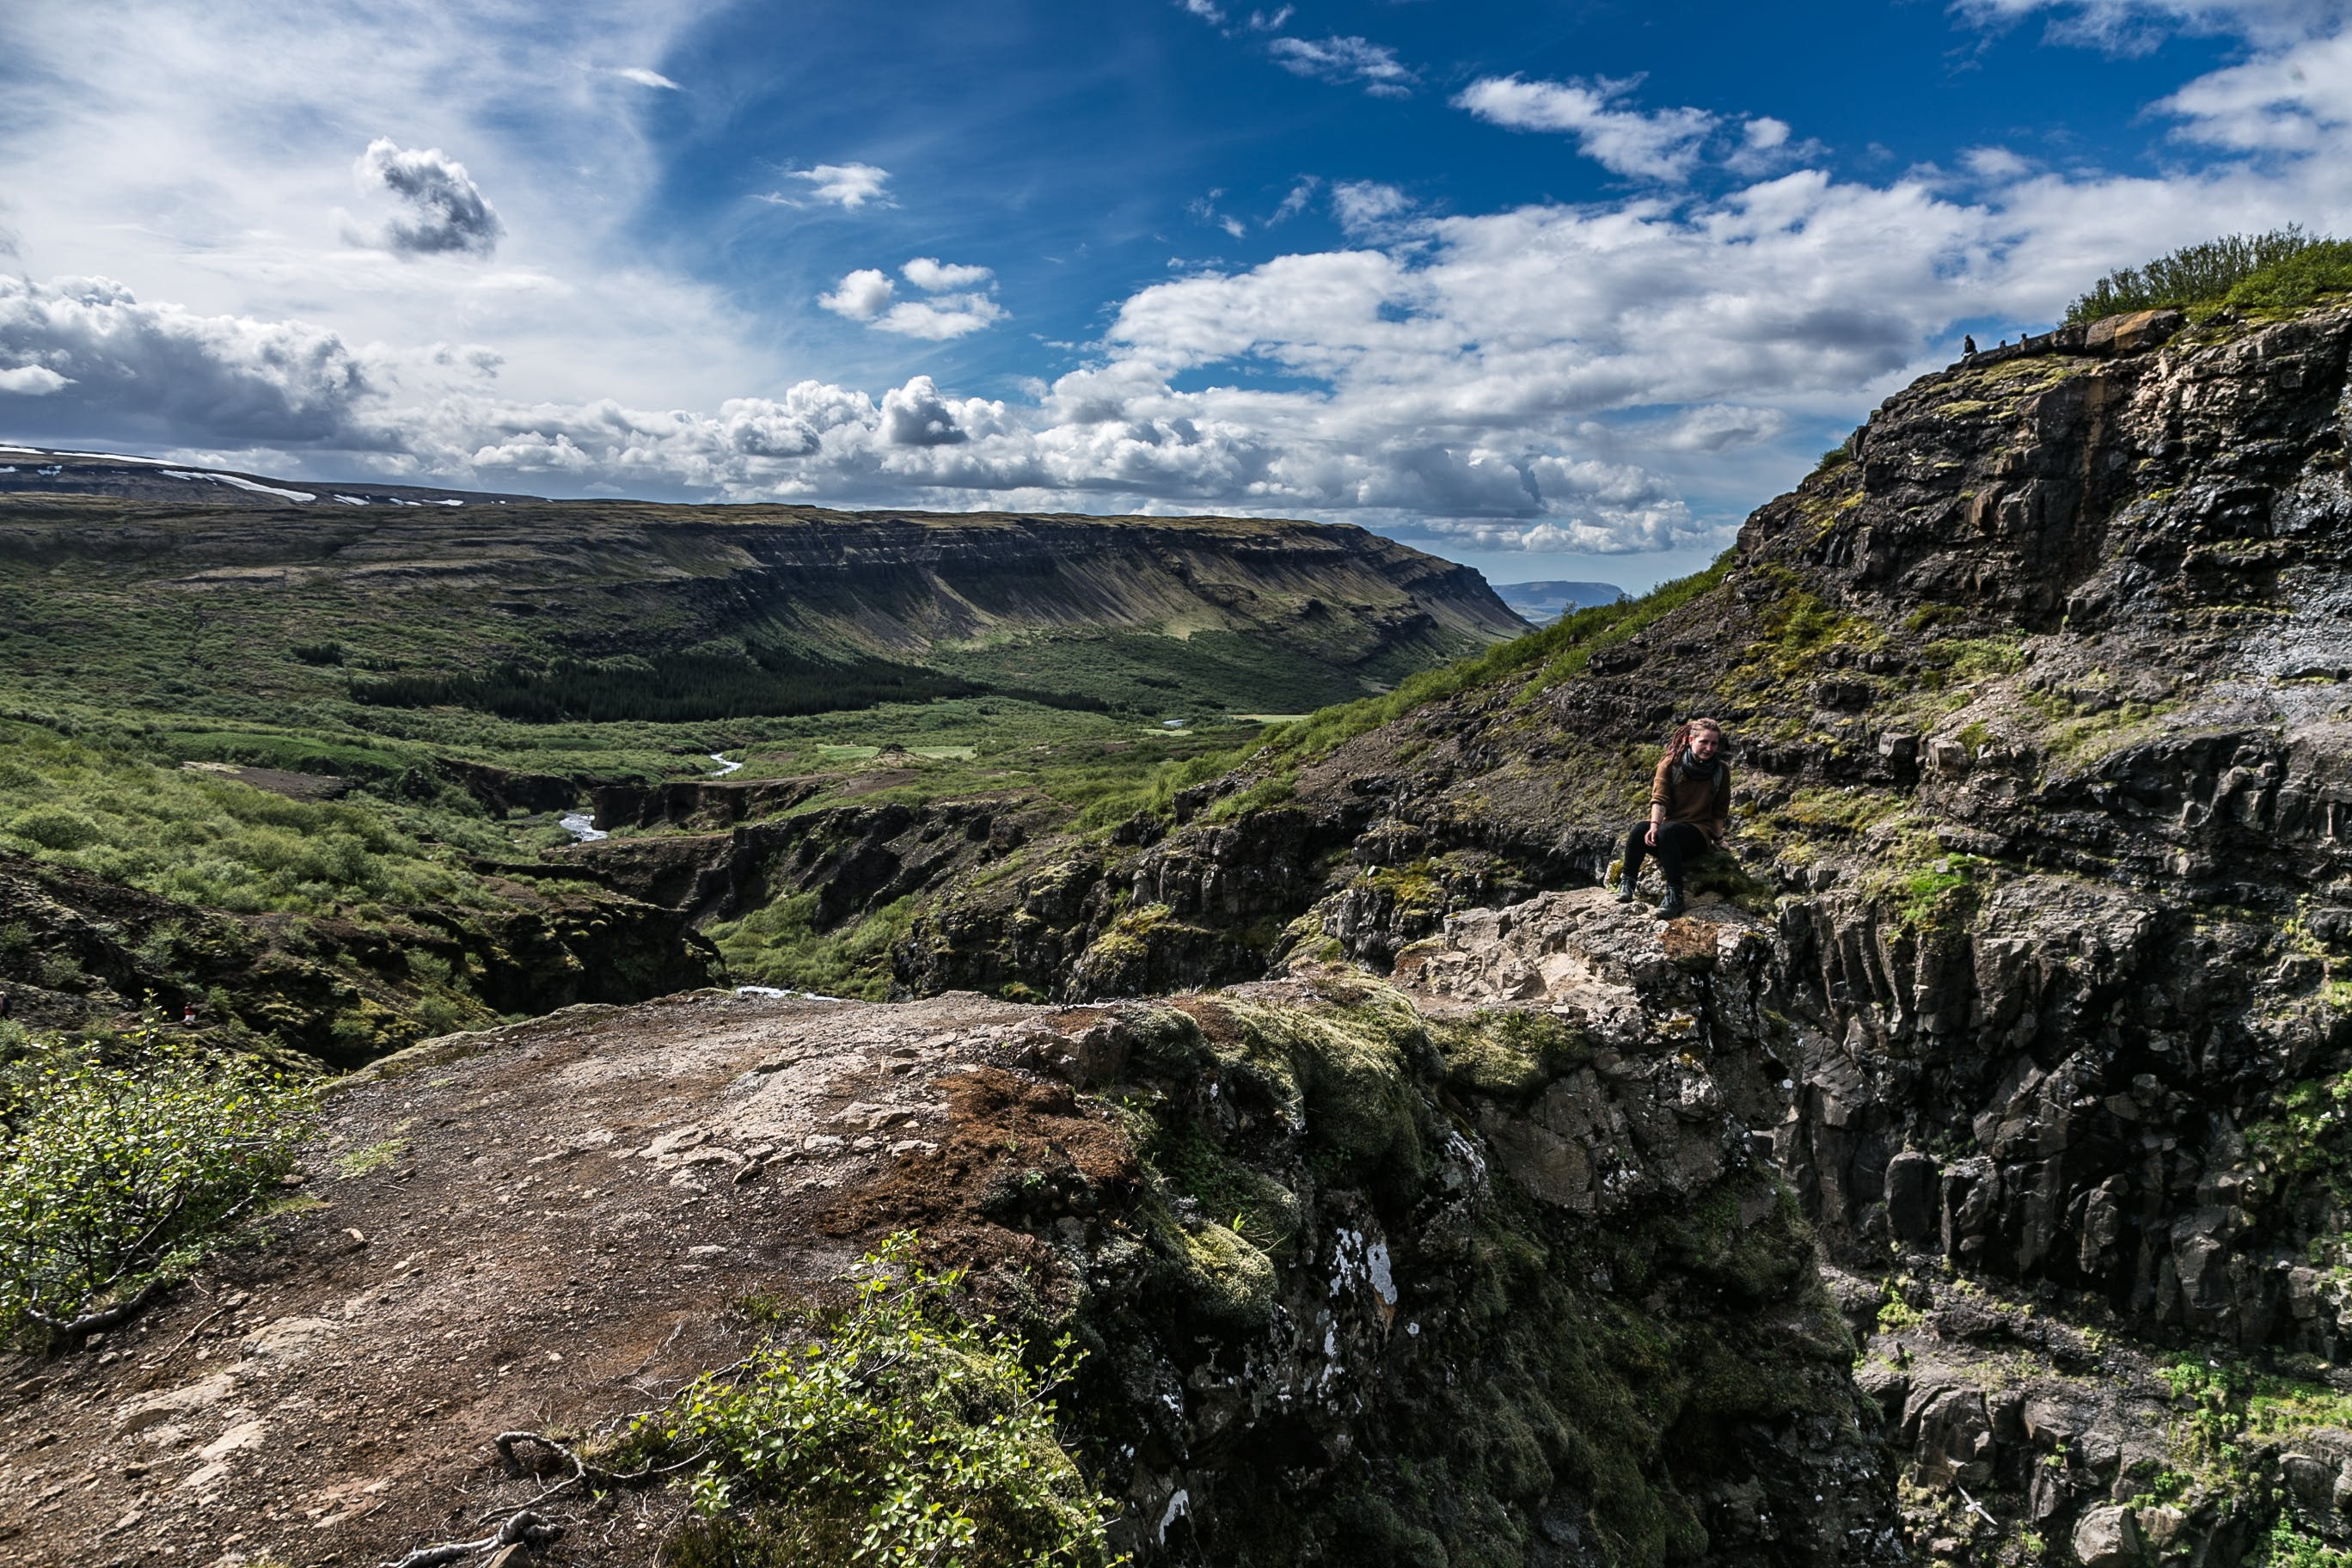 Person Near Mountain Cliff